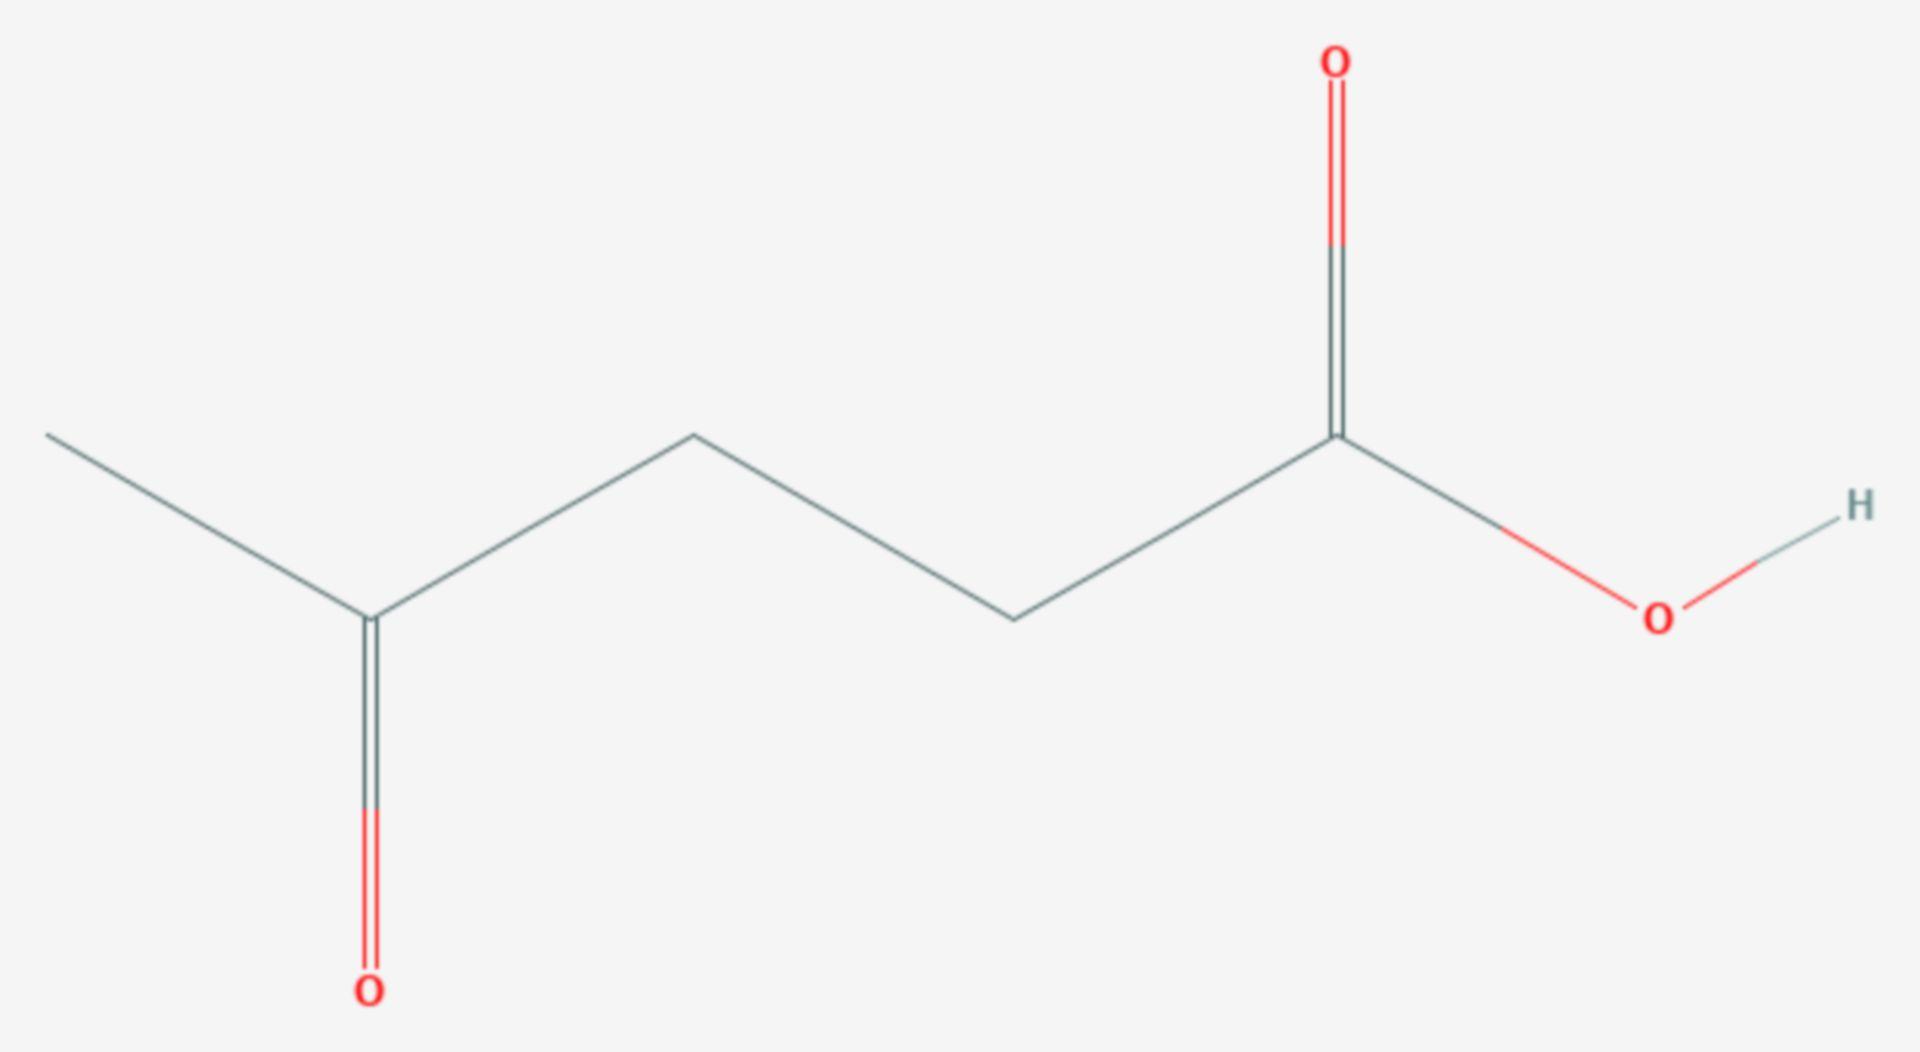 Lävulinsäure (Strukturformel)